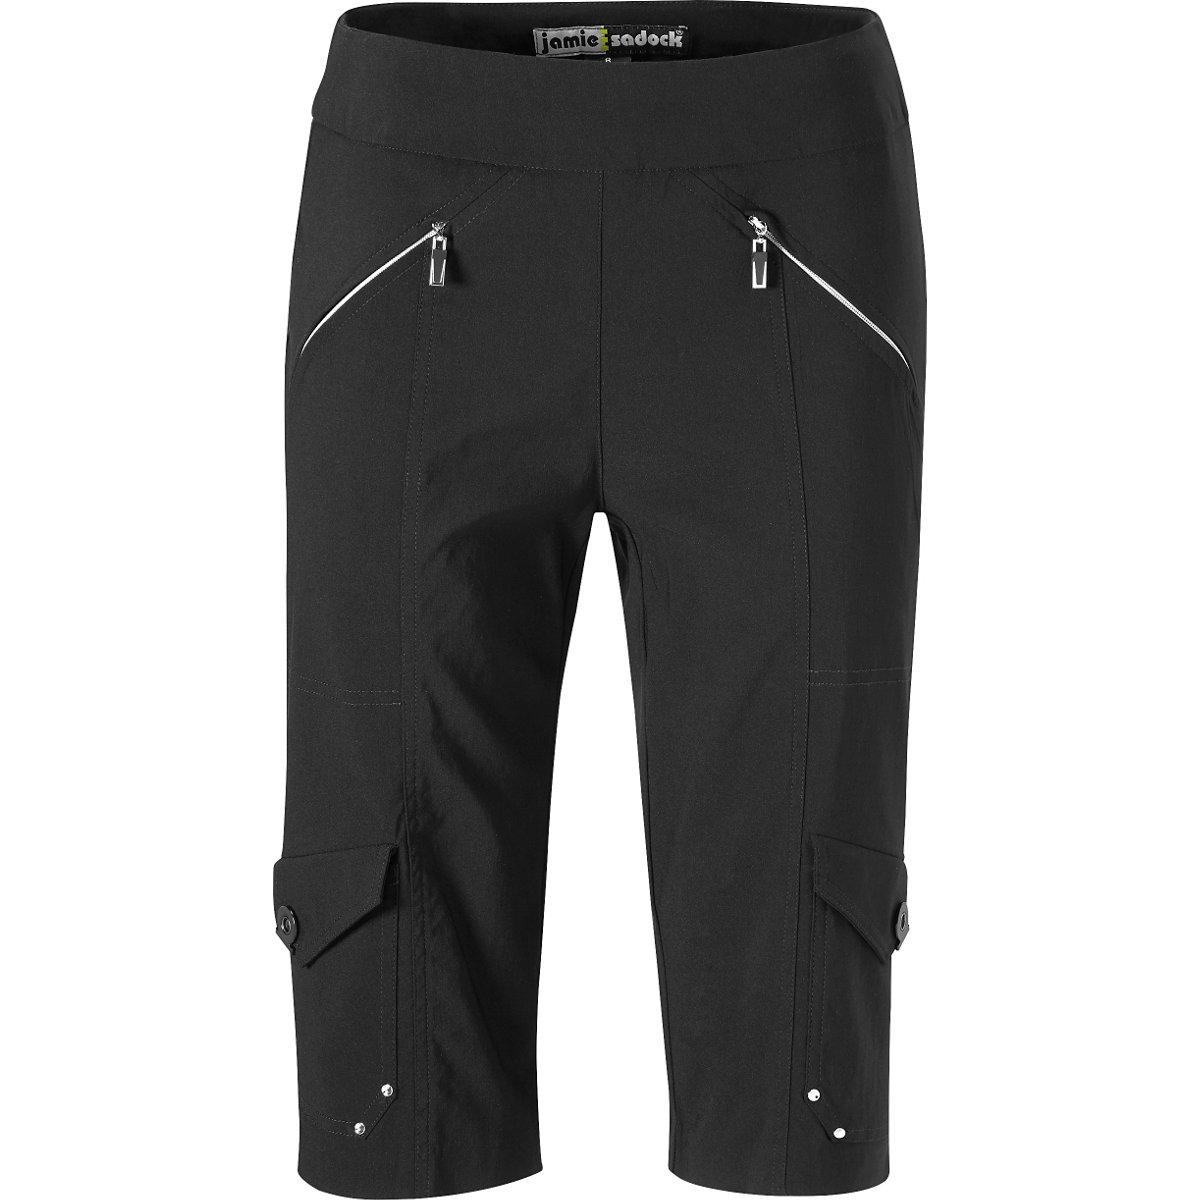 Ladies Black Capri Pants